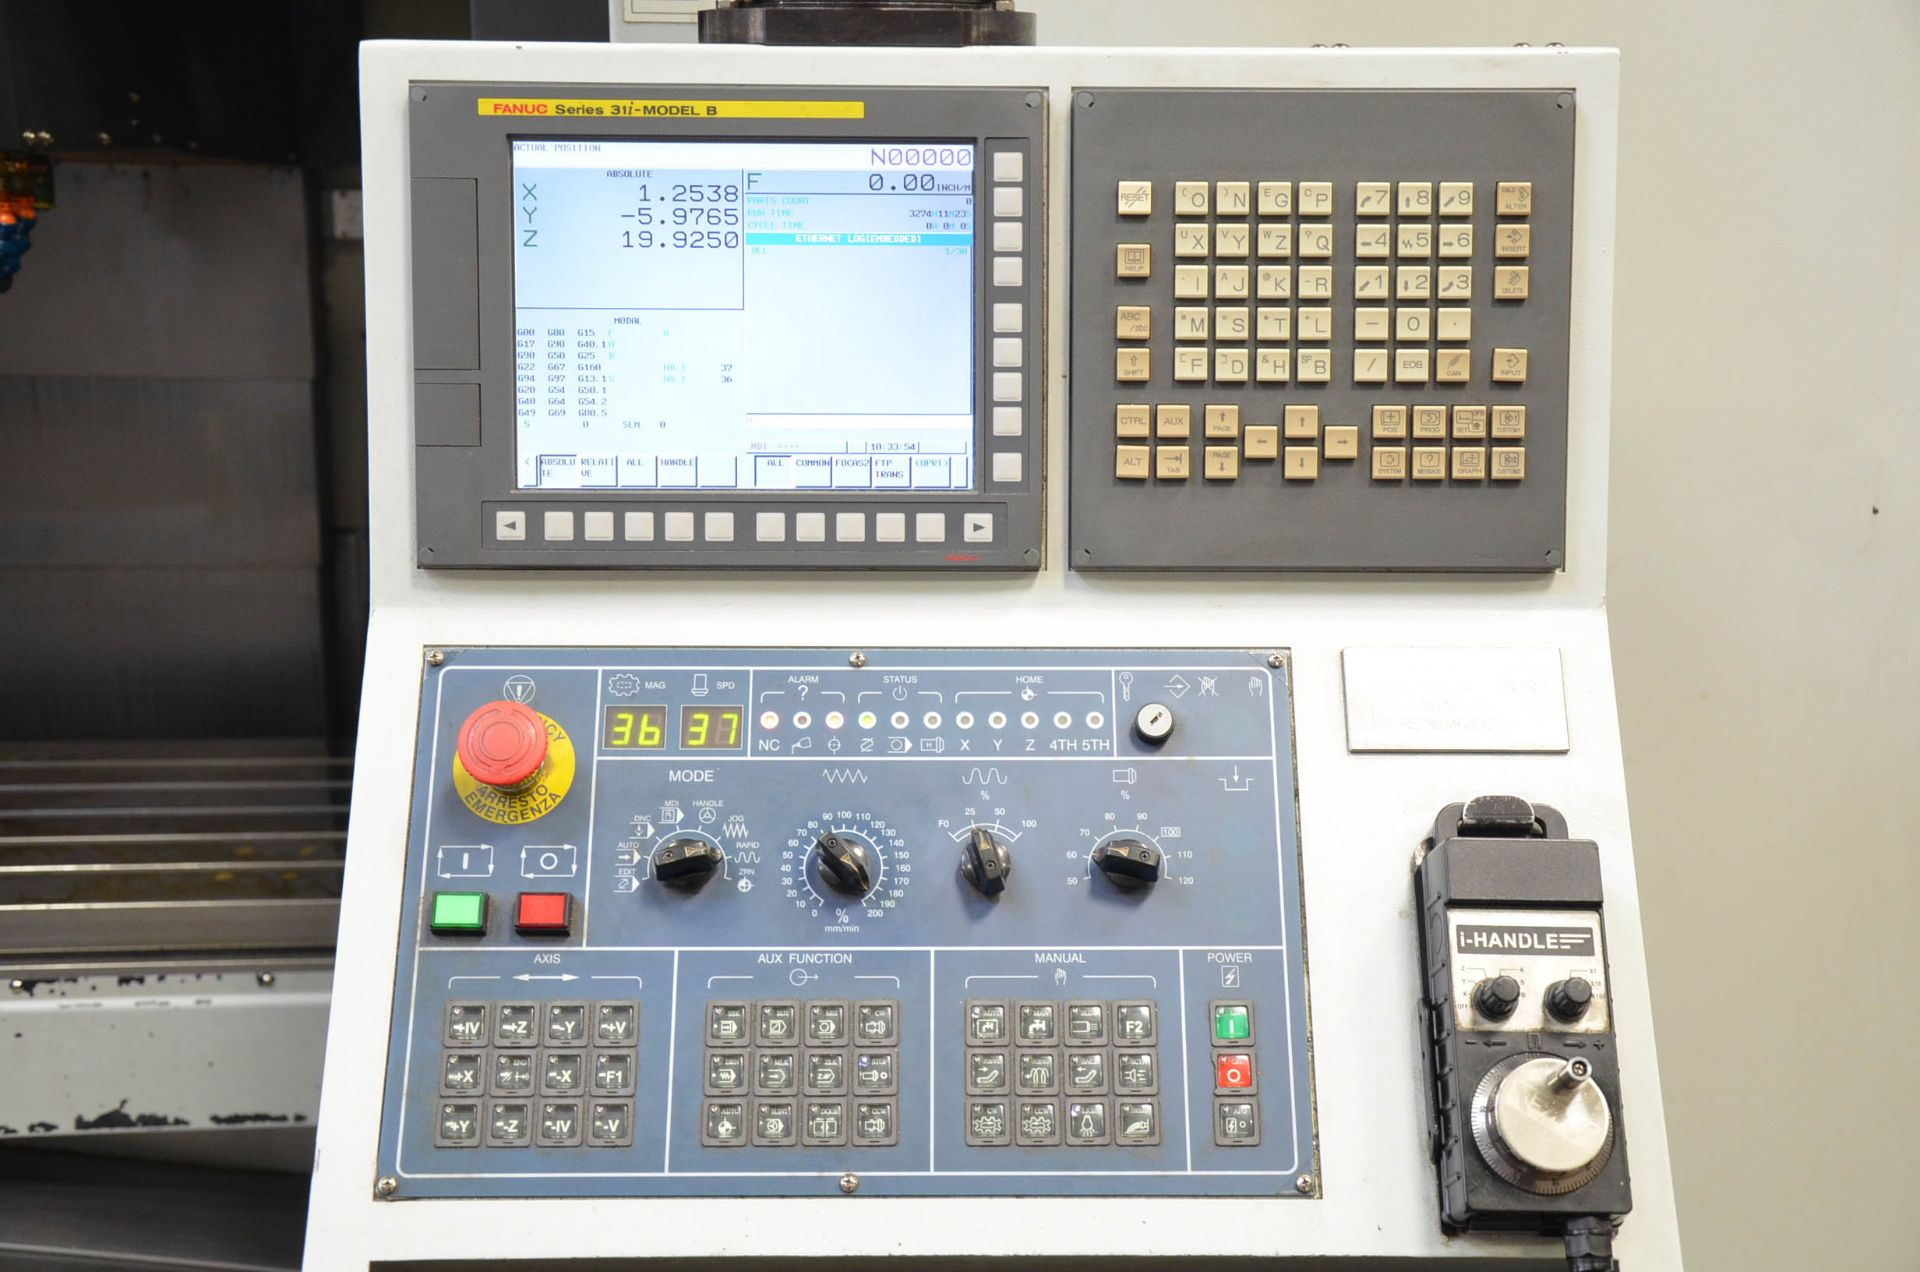 AWEA YAMA SEIKI (2012) AF-1250 CNC VERTICAL MACHINING CENTER WITH FANUC SERIES 31I-MODEL B CNC - Image 7 of 10